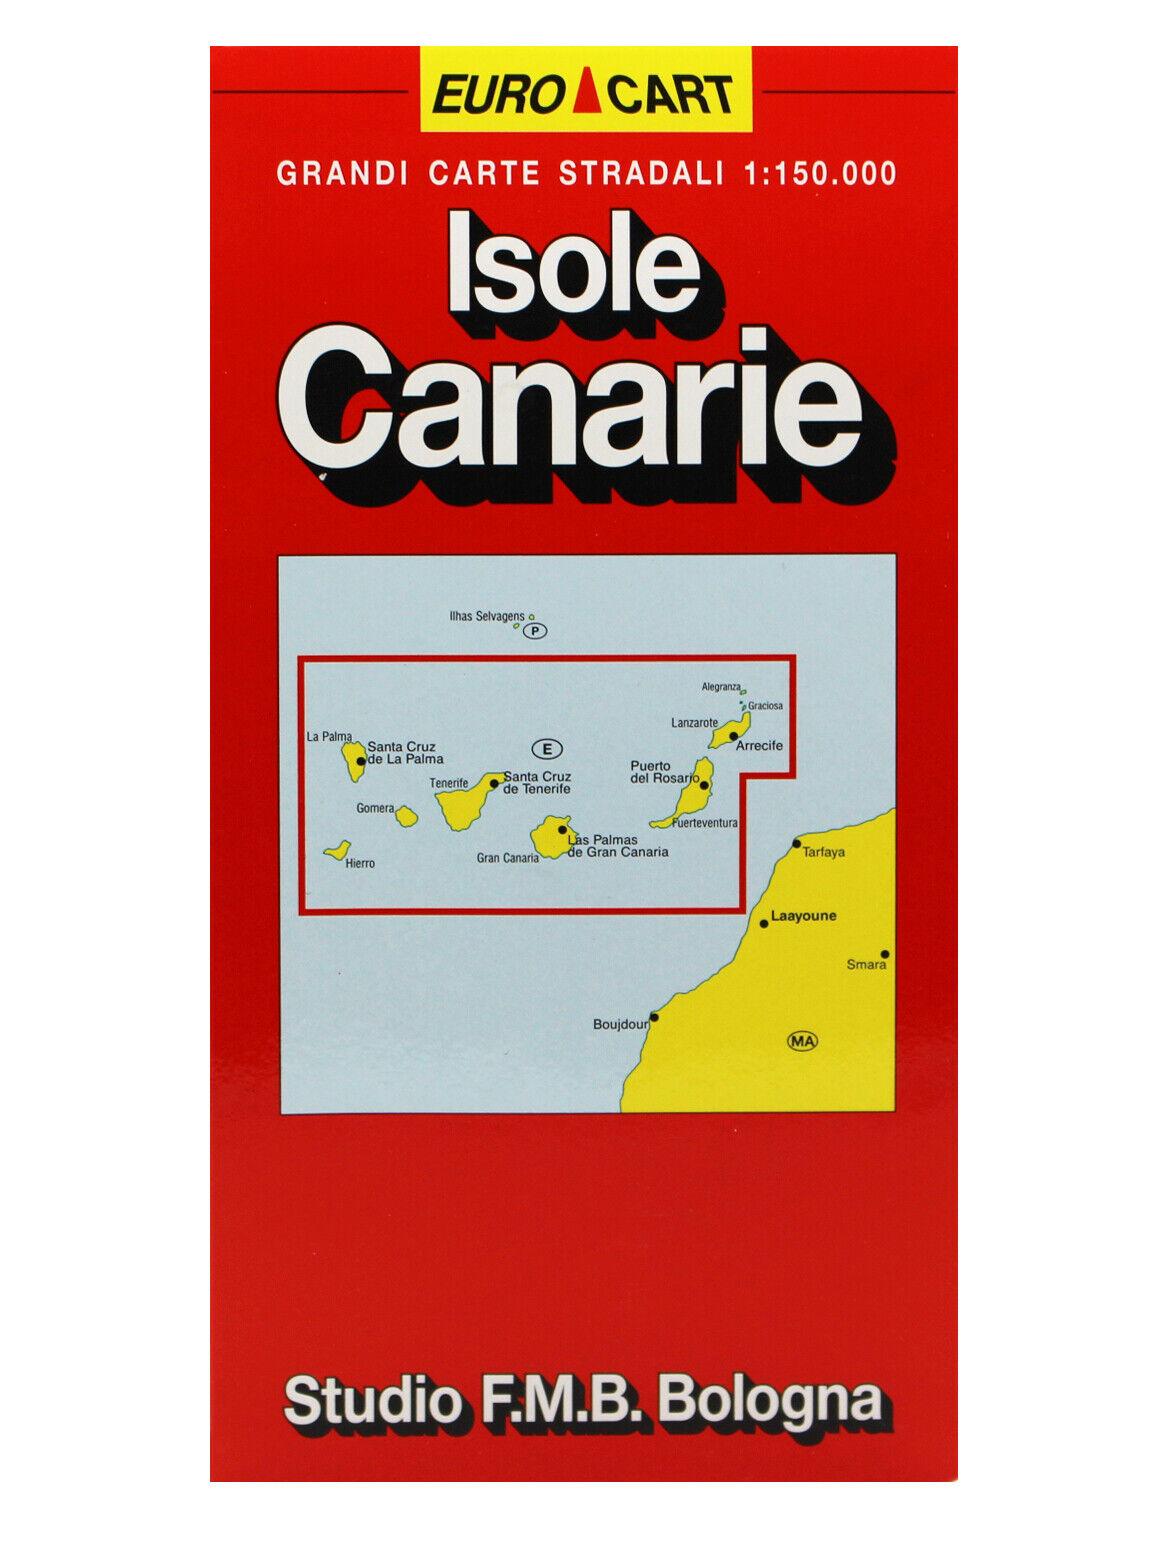 Tenerife Cartina Stradale.Isole Canarie Cartina Stradale Scala 1 150 000 Carta Mappa Studio F M B Ebay